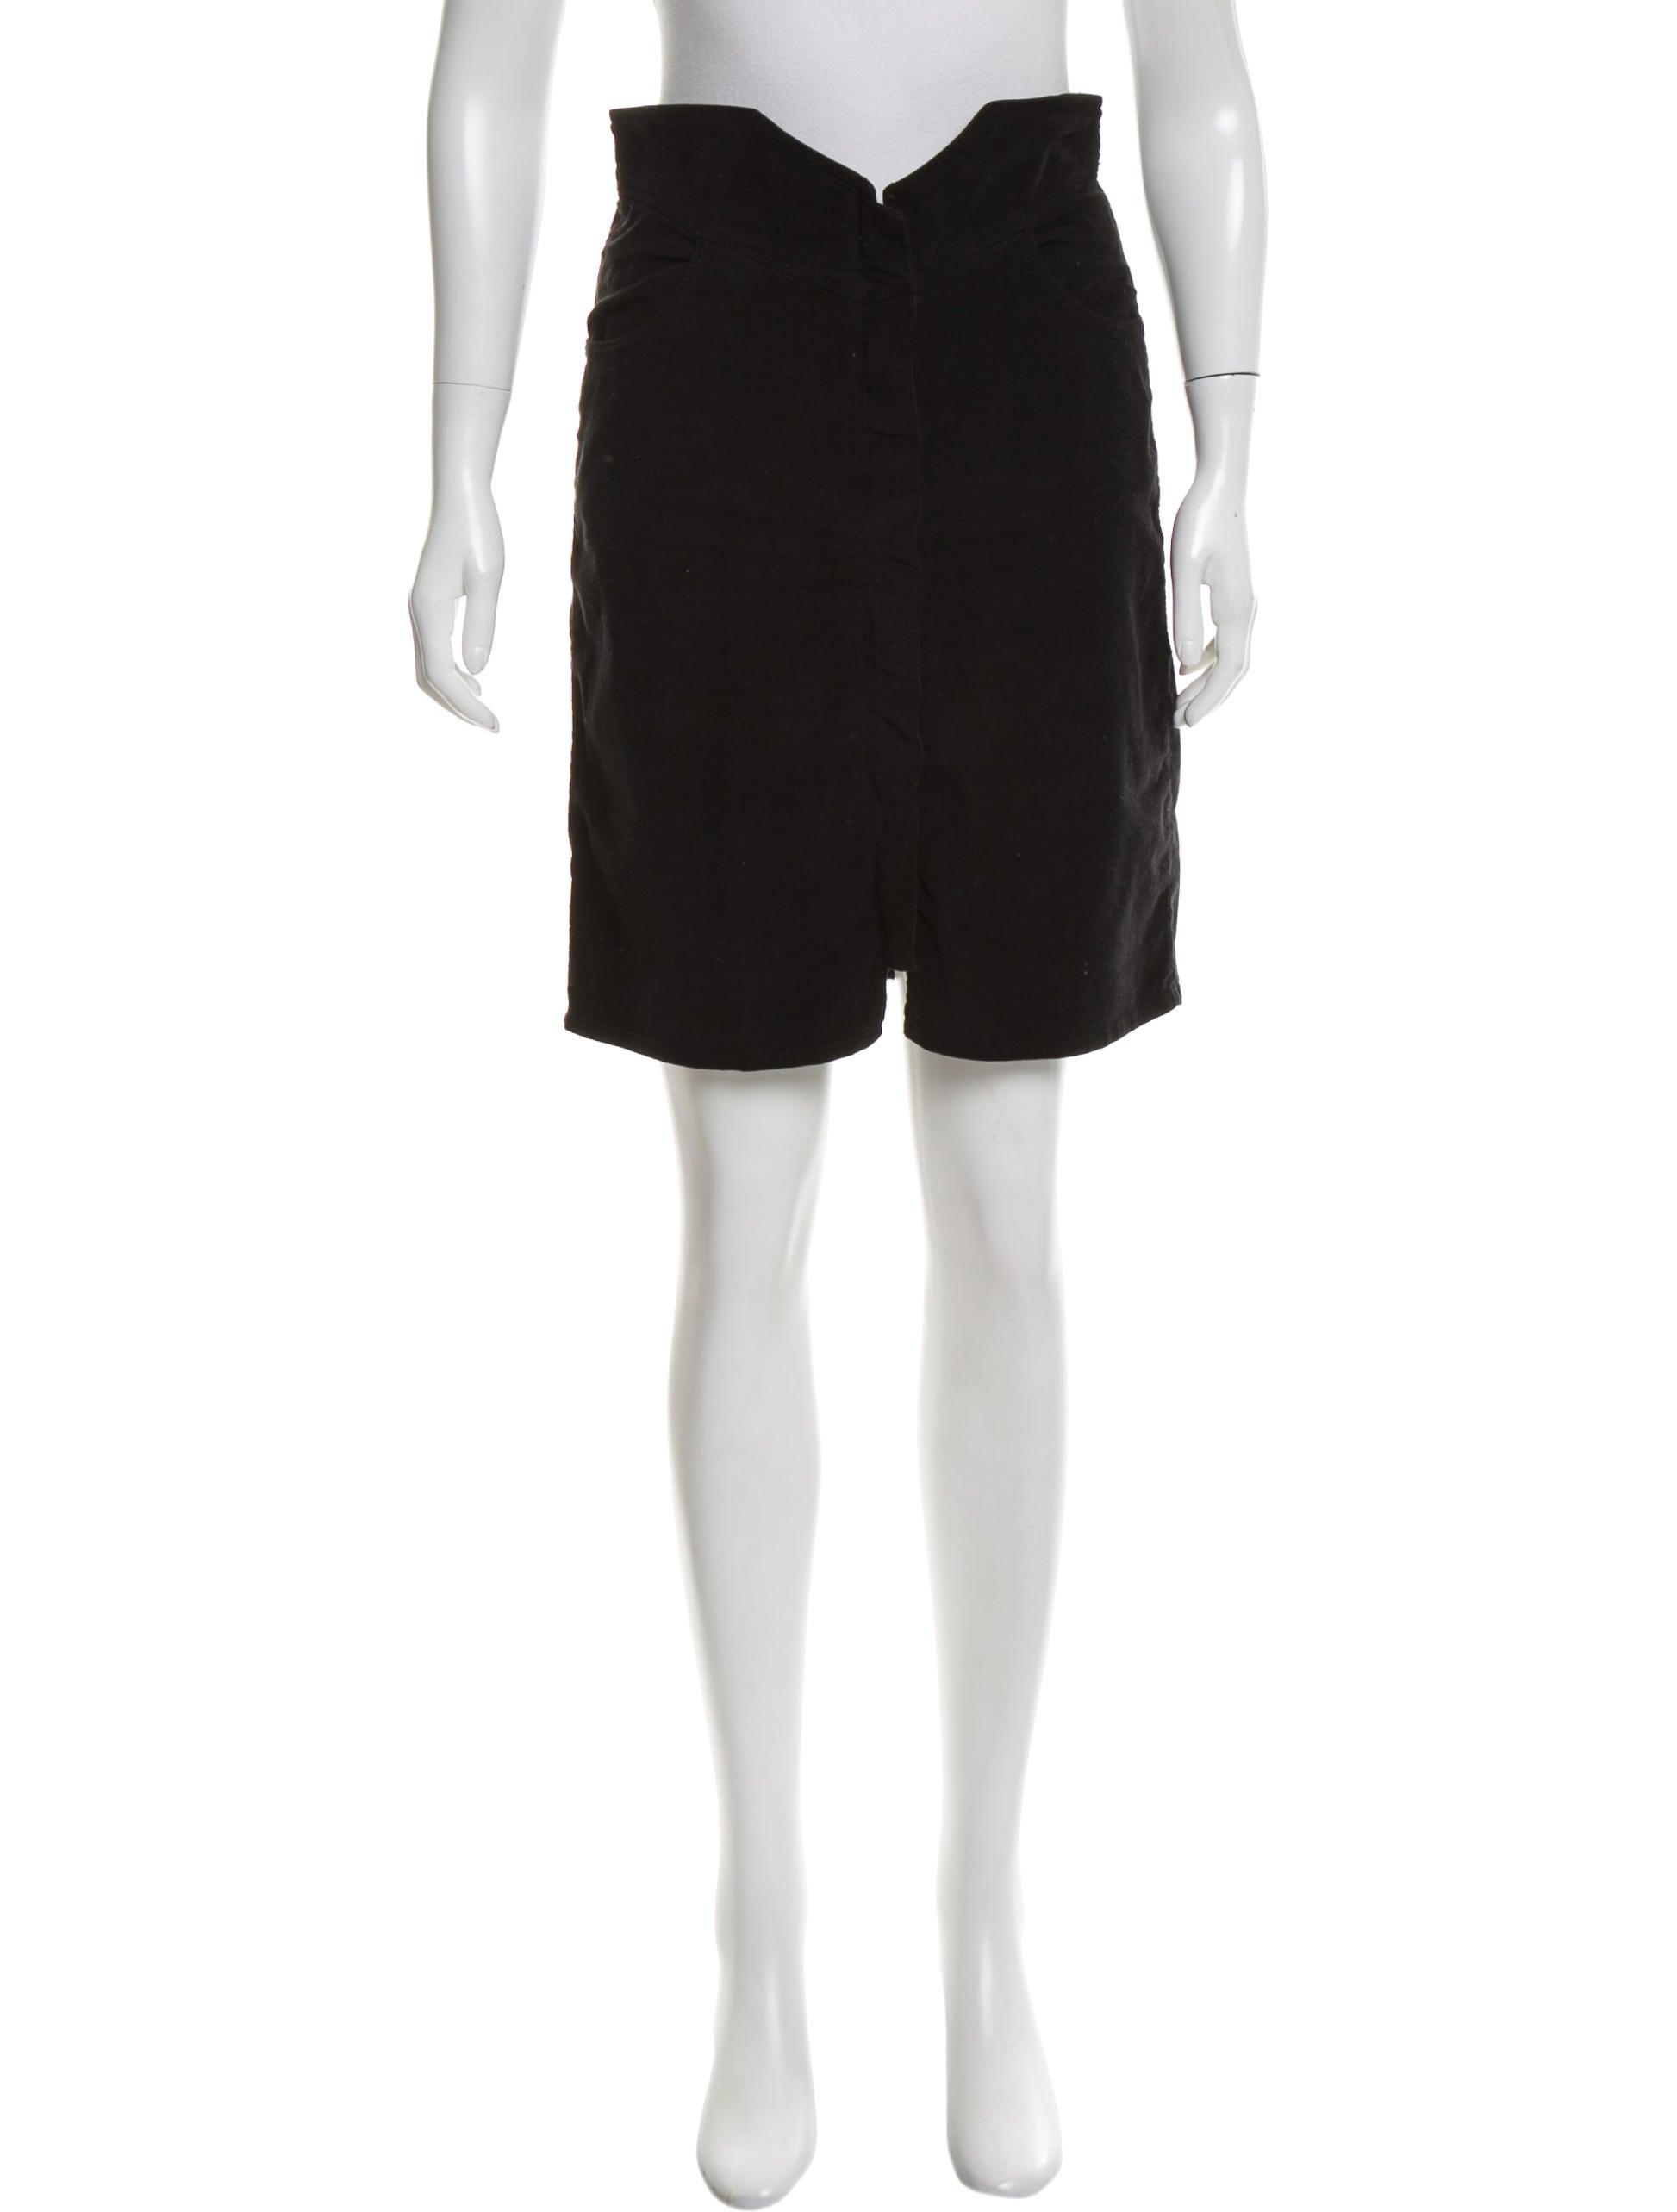 201 toile marant knee length corduroy skirt clothing